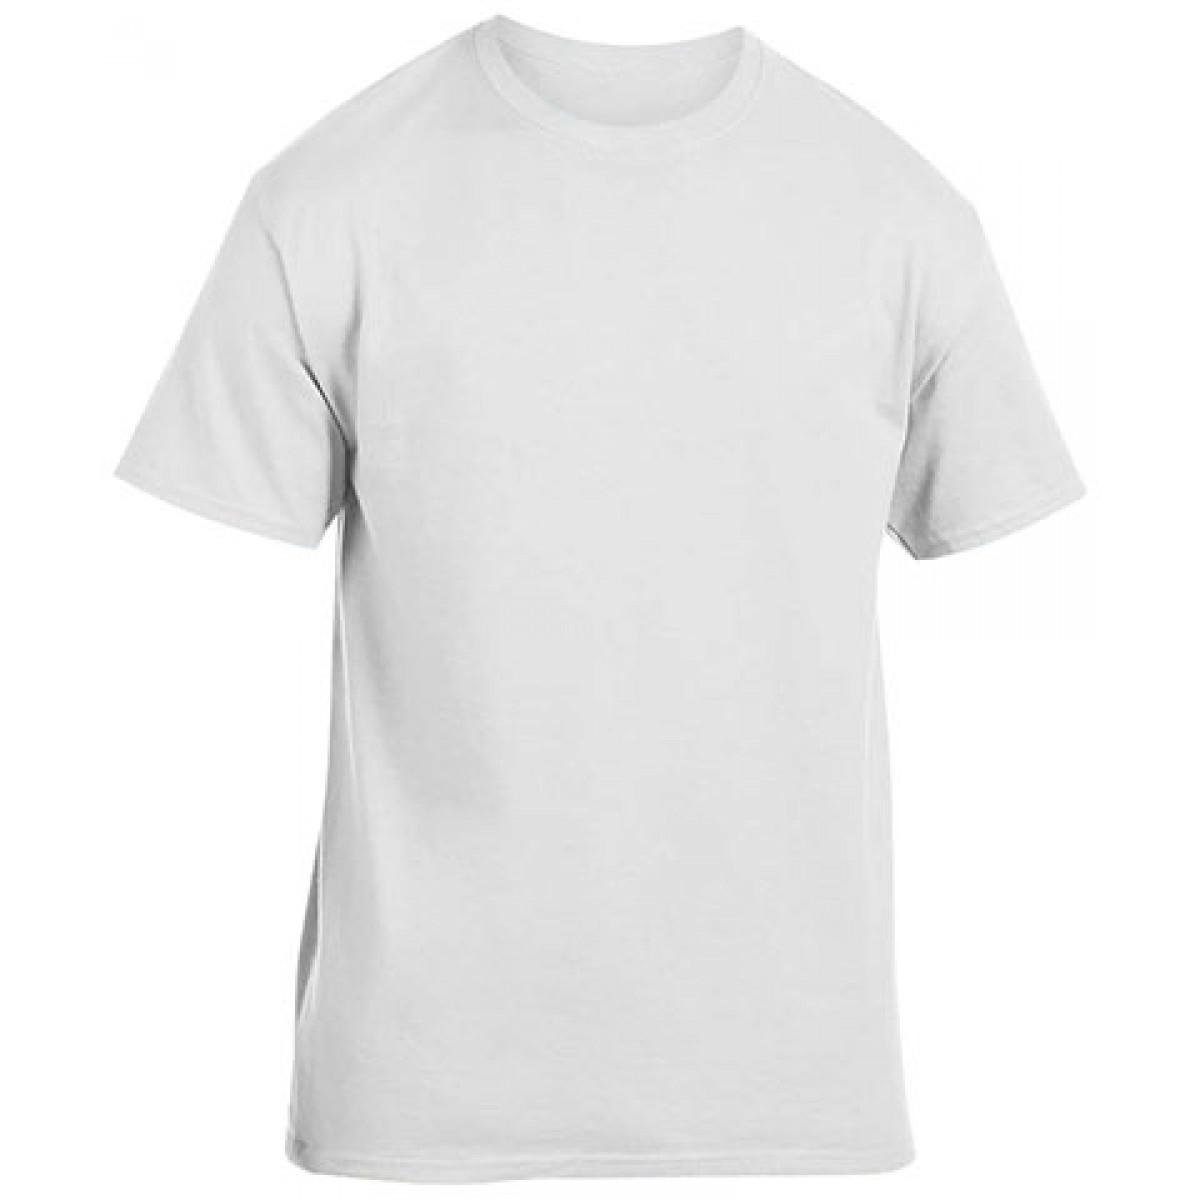 Cotton Short Sleeve T-Shirt-White-M